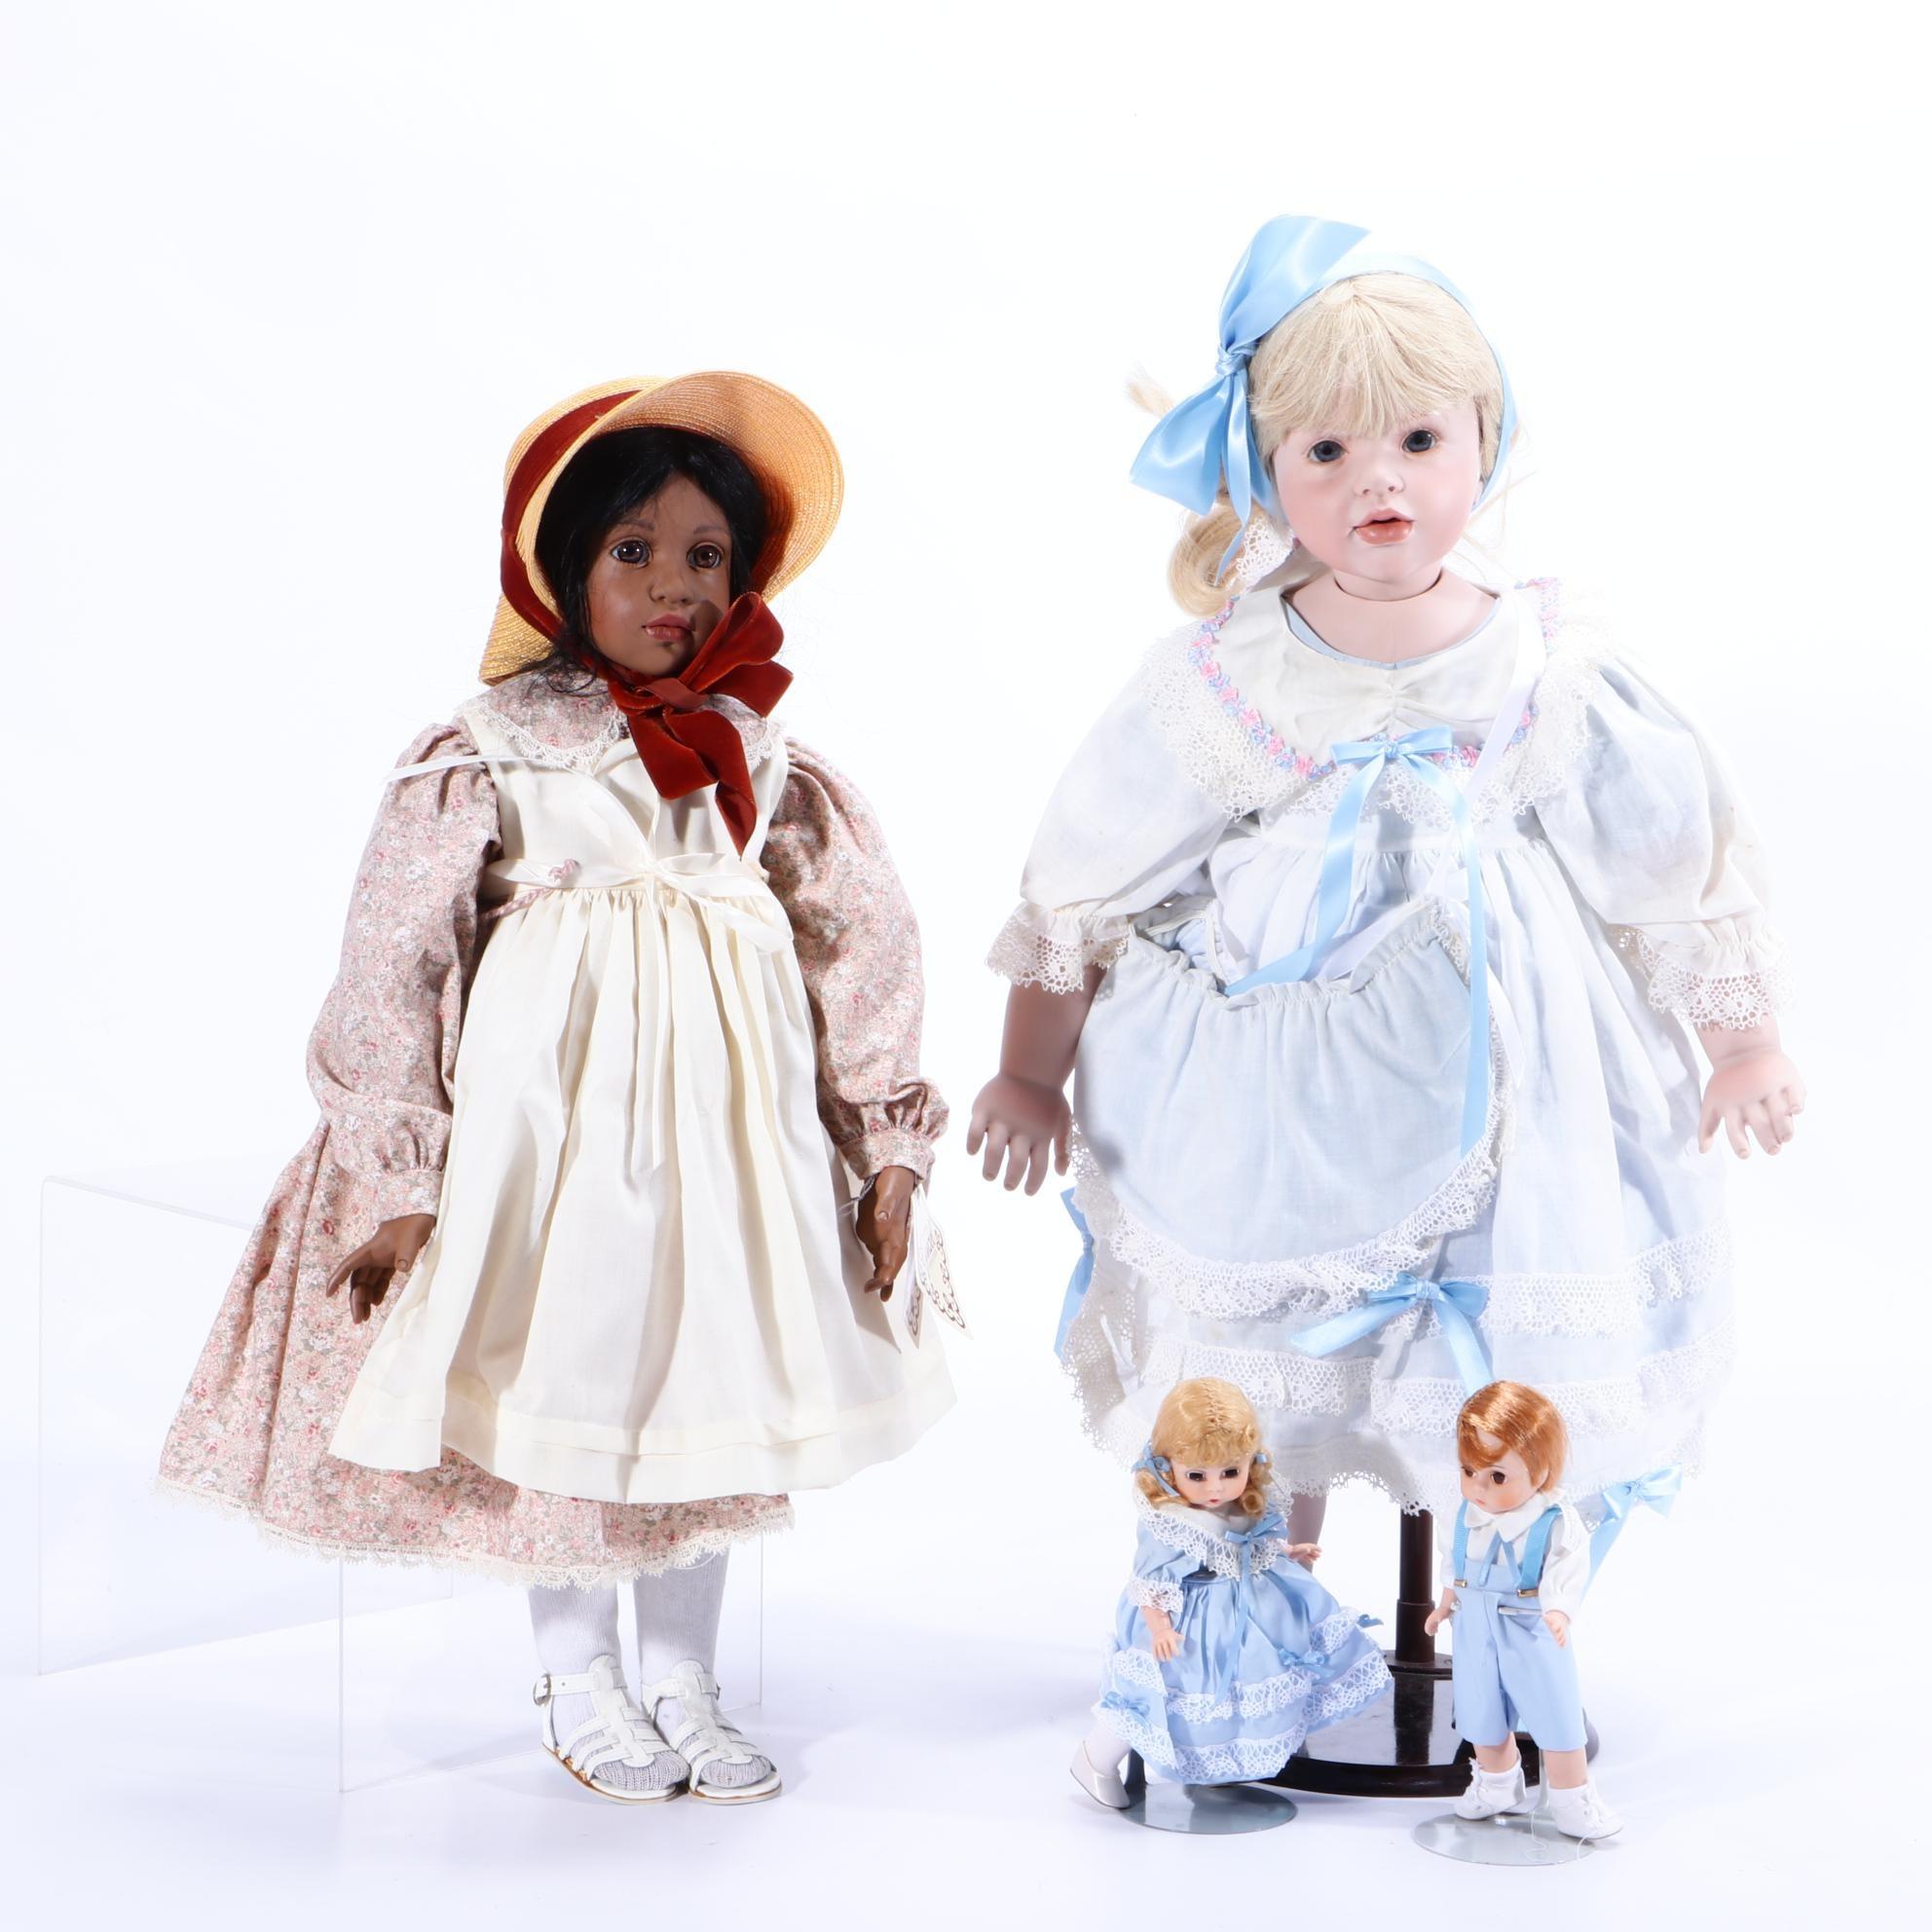 Limited Edition Hildegard Günzel Collection Porcelain Dolls